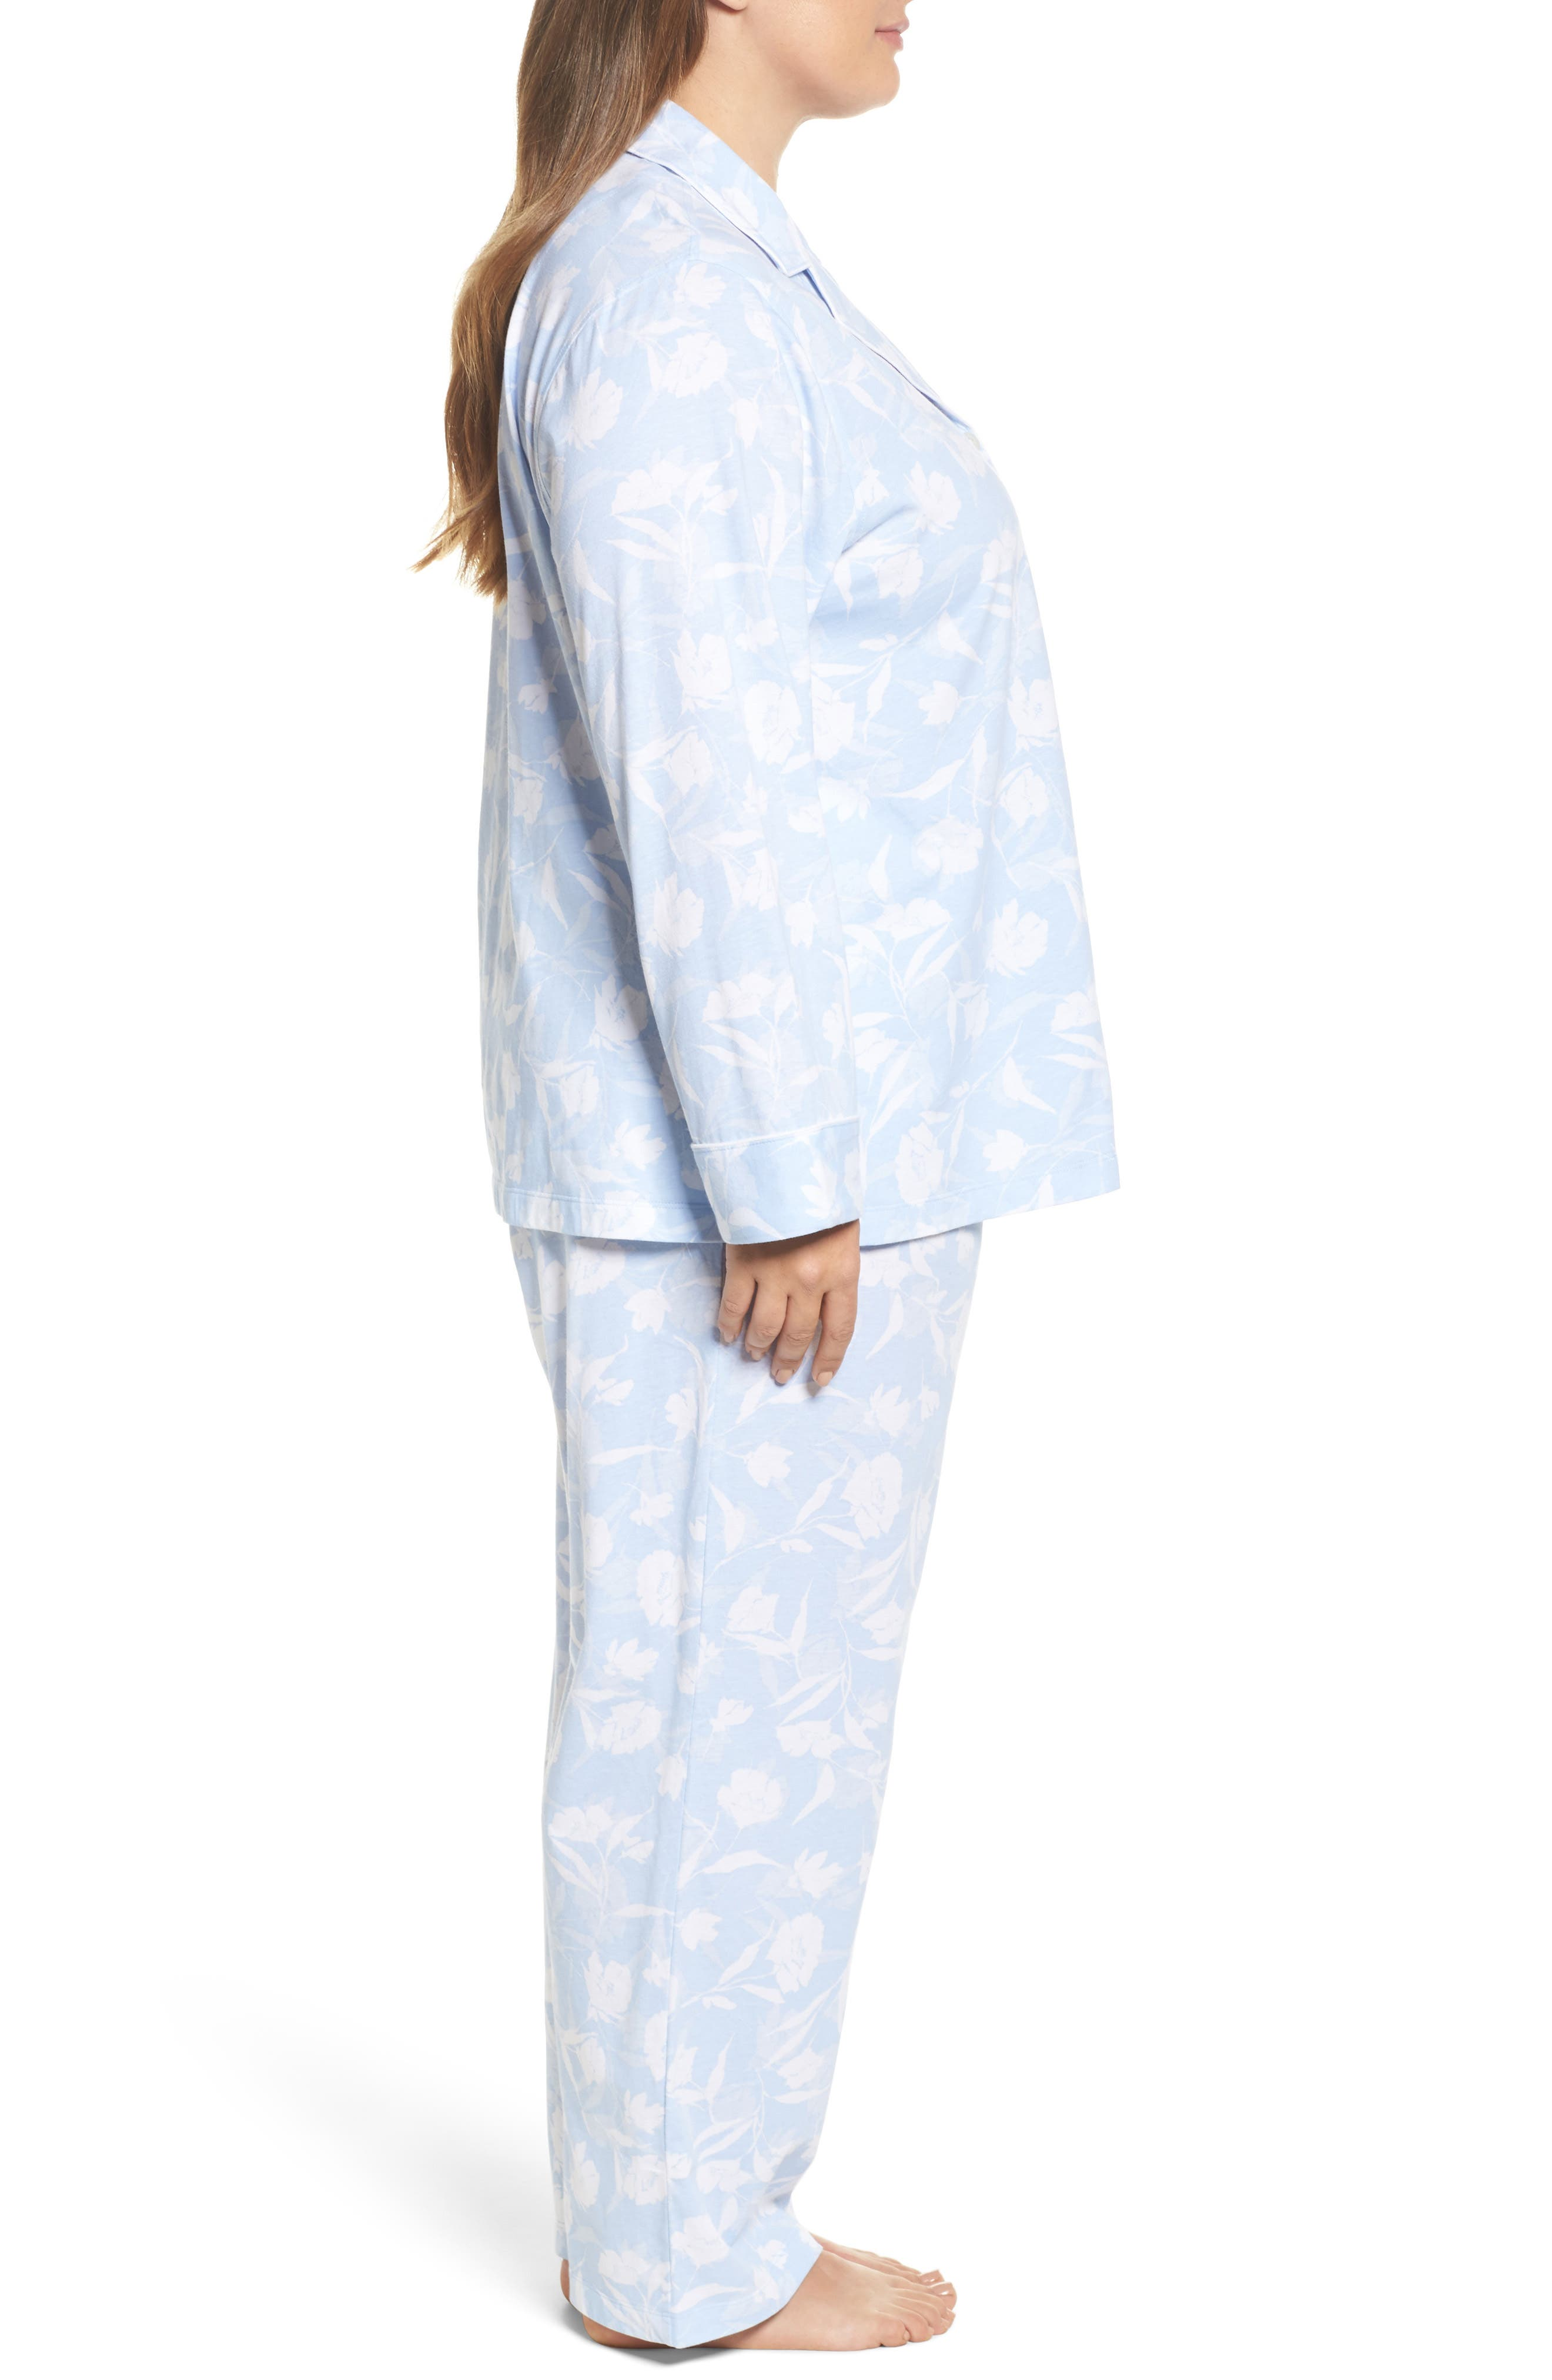 Floral Print Jersey Pajamas,                             Alternate thumbnail 3, color,                             Blue Monotone Floral